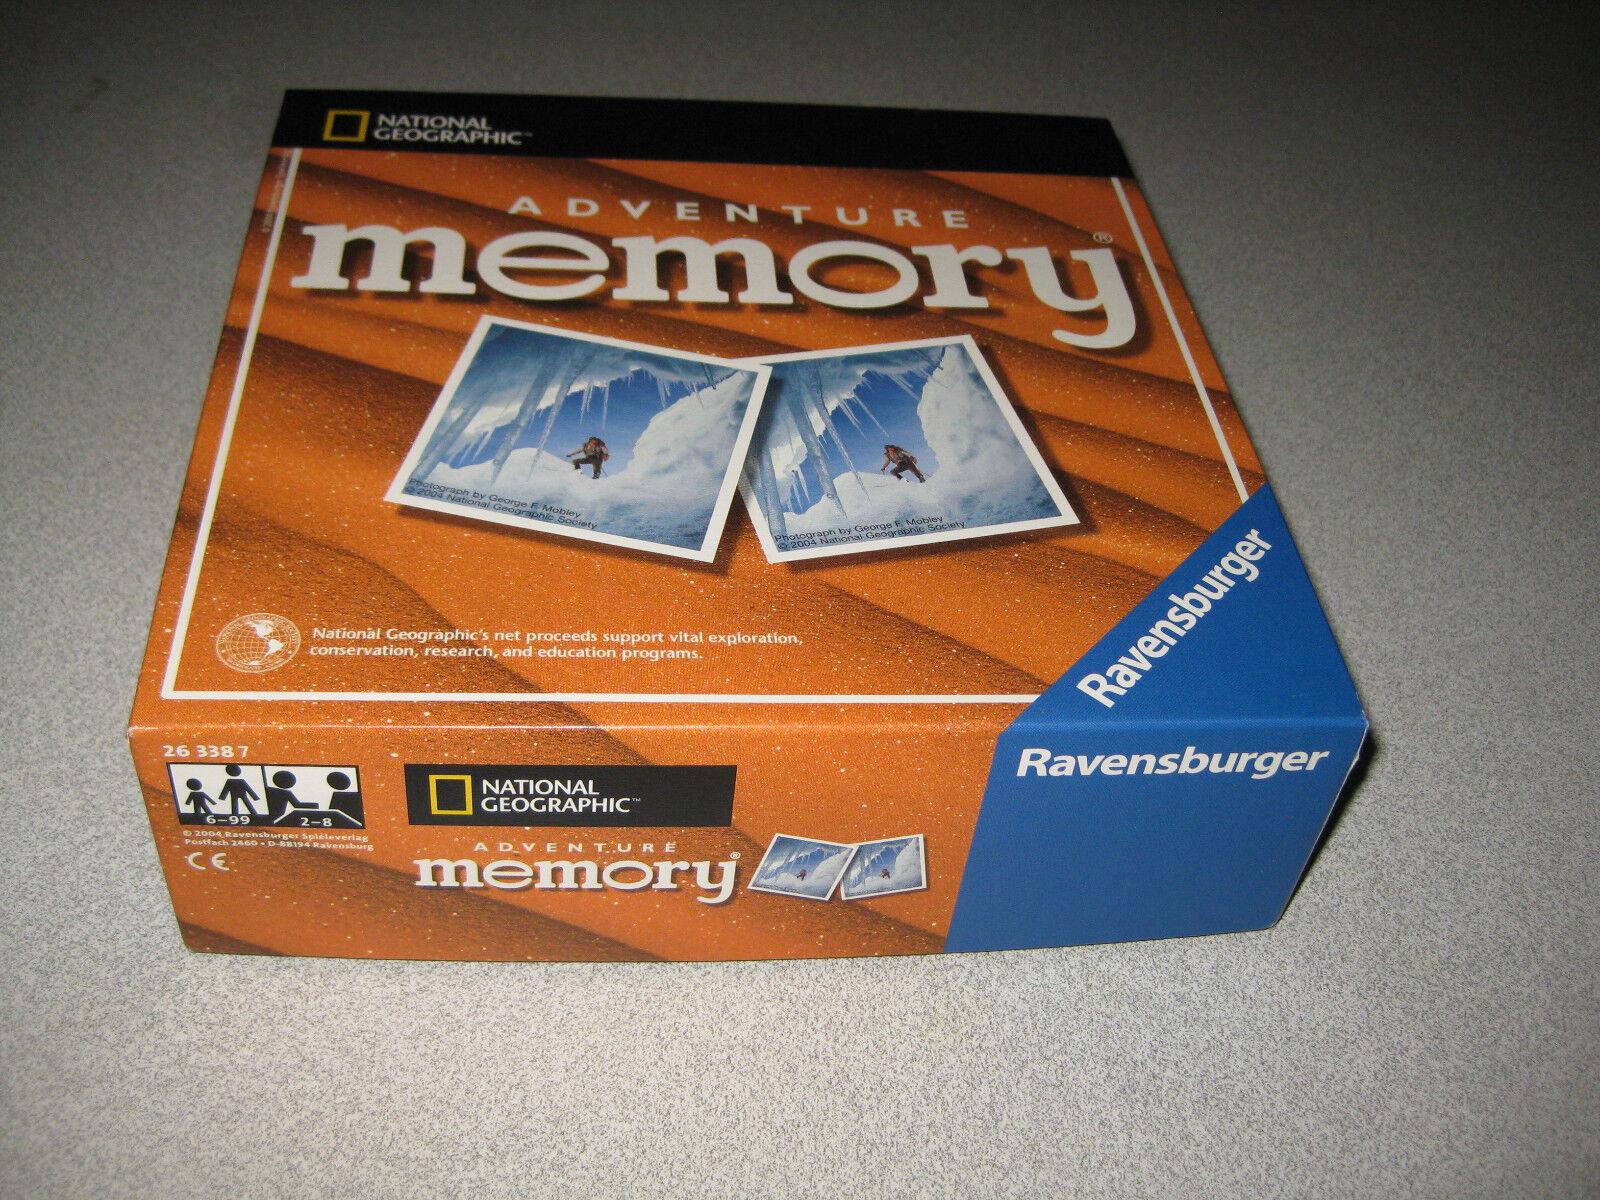 Ravensburger Memory Memory Memory Art. 263387 Adventure National Geographic RAR selten 32d546